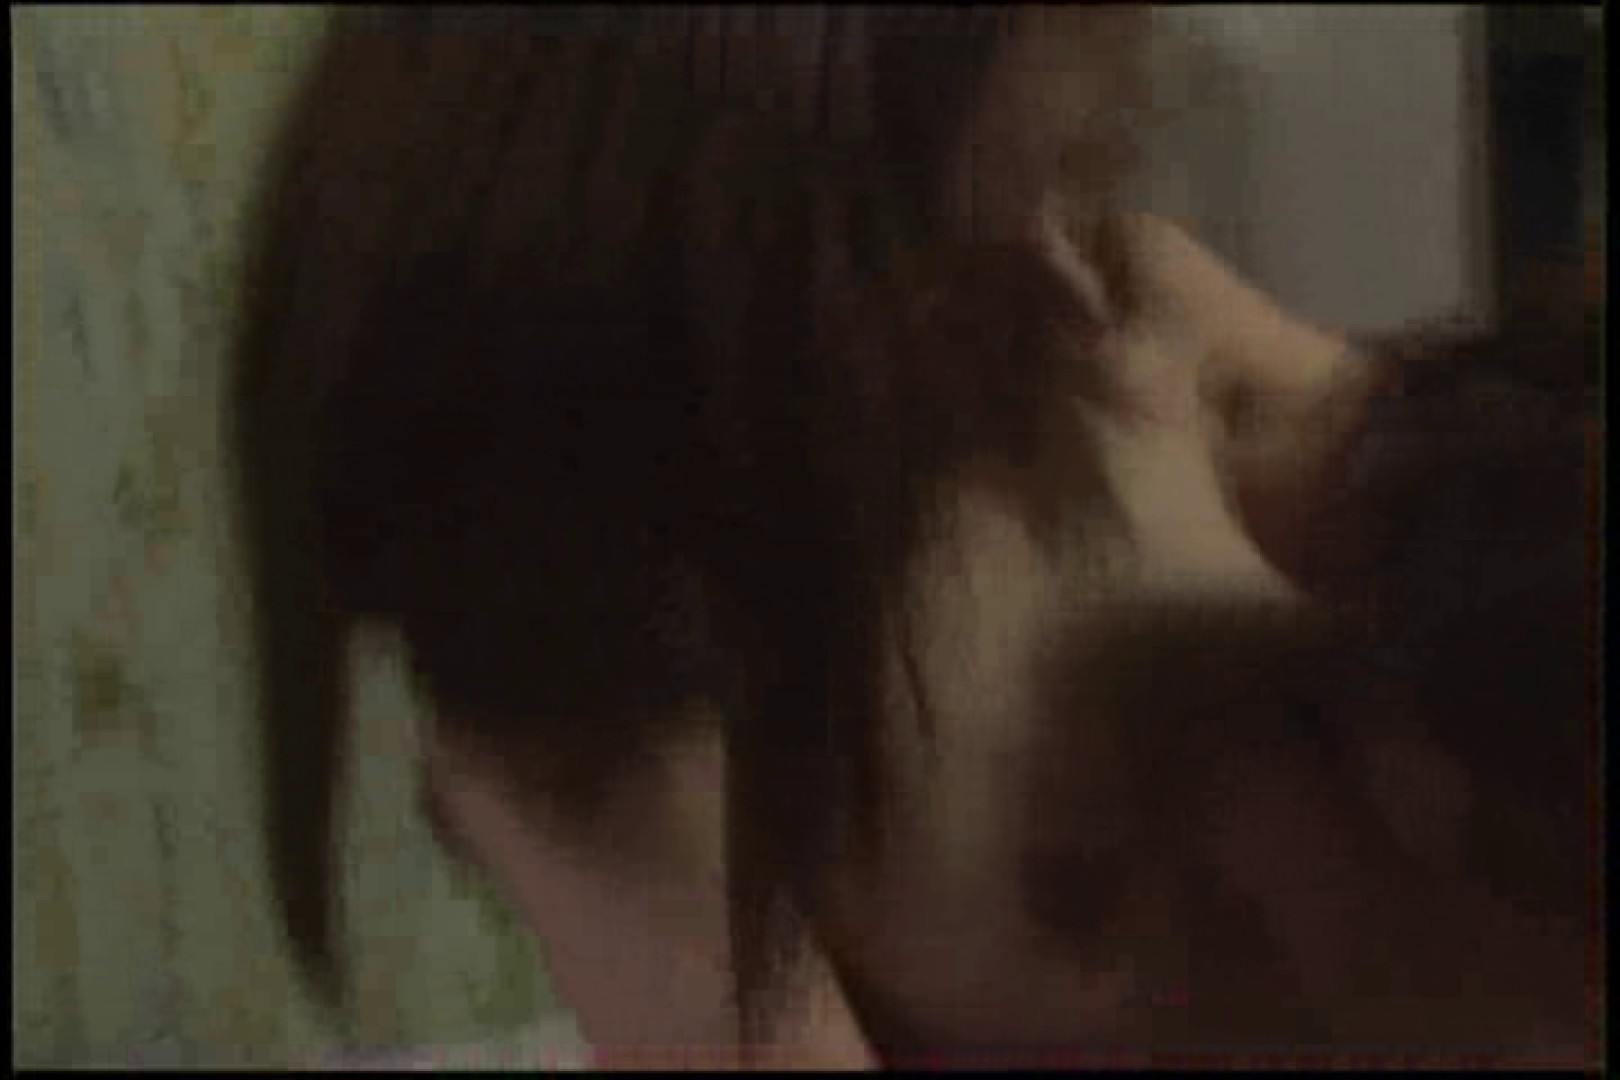 Hなフェロモン漂わせまくりな美人妻 佐々木薫子 エッチな人妻 | おっぱい特集  73pic 49